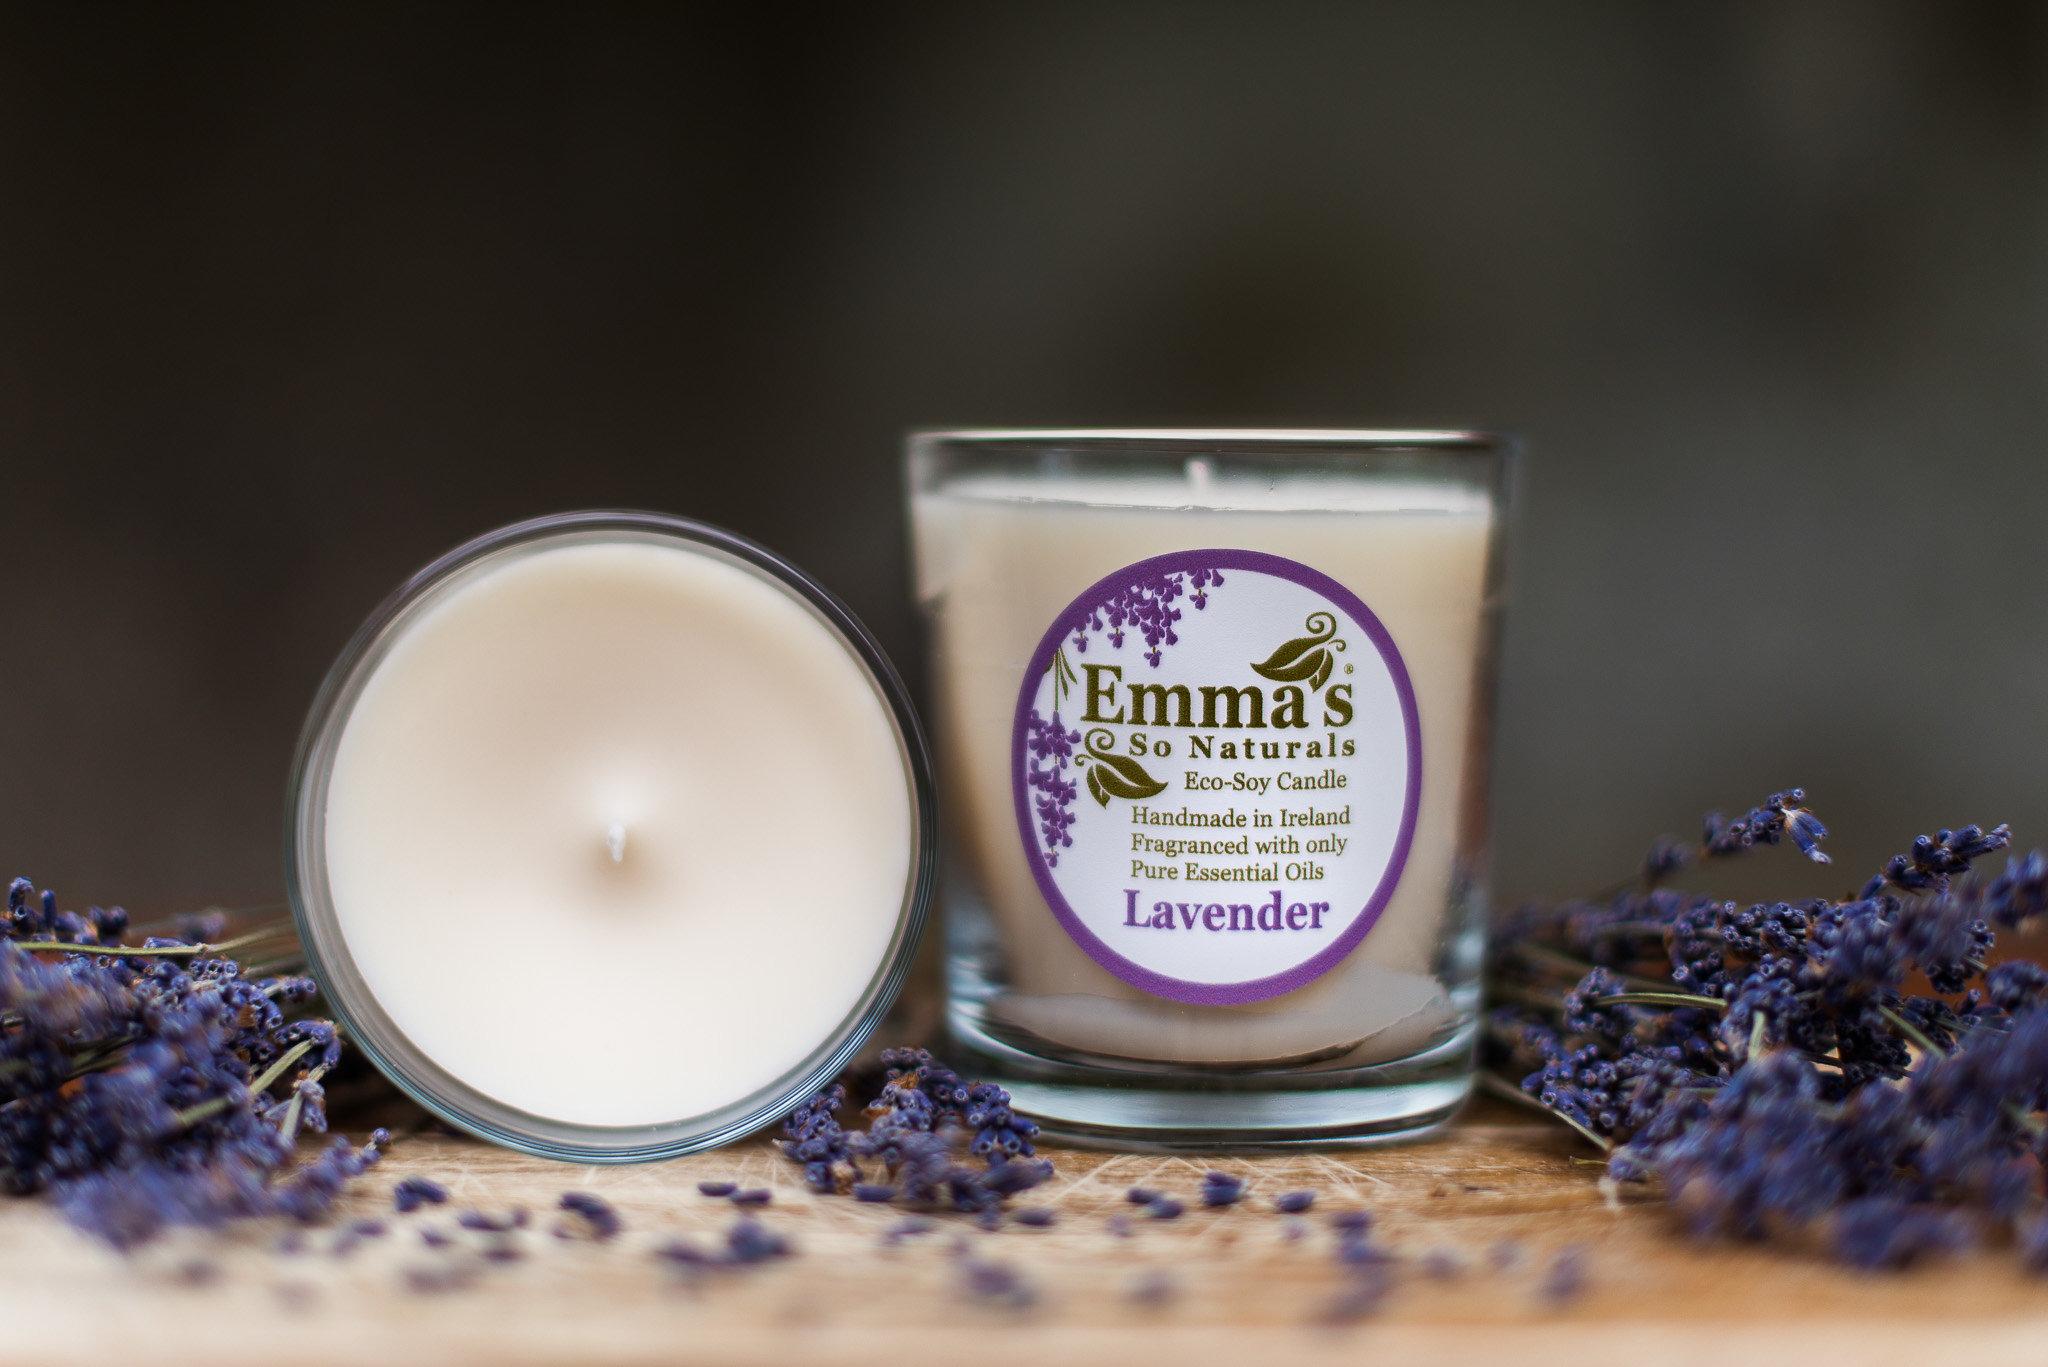 Emma's_So_Naturals_Lavender_Tumbler_Candle_&_Box